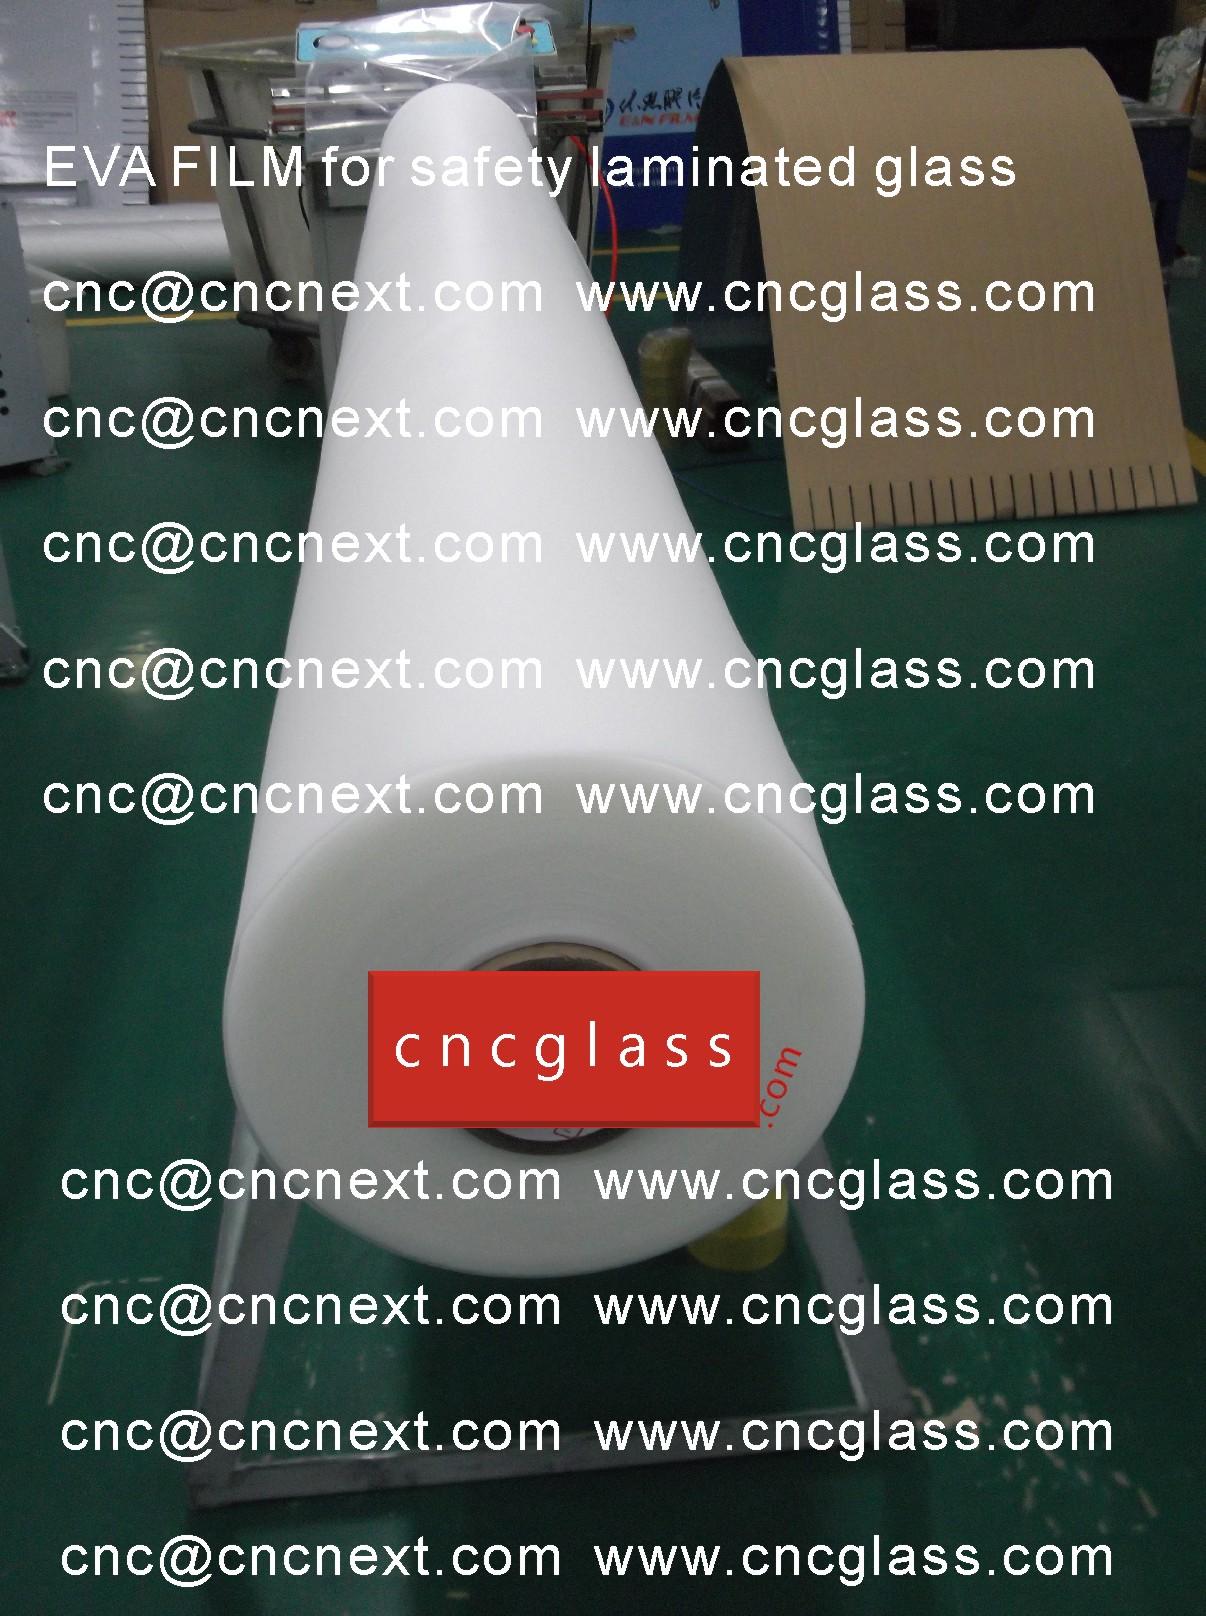 002 EVAFORCE EVA FILM FOR SAFETY LAMINATED GLASS